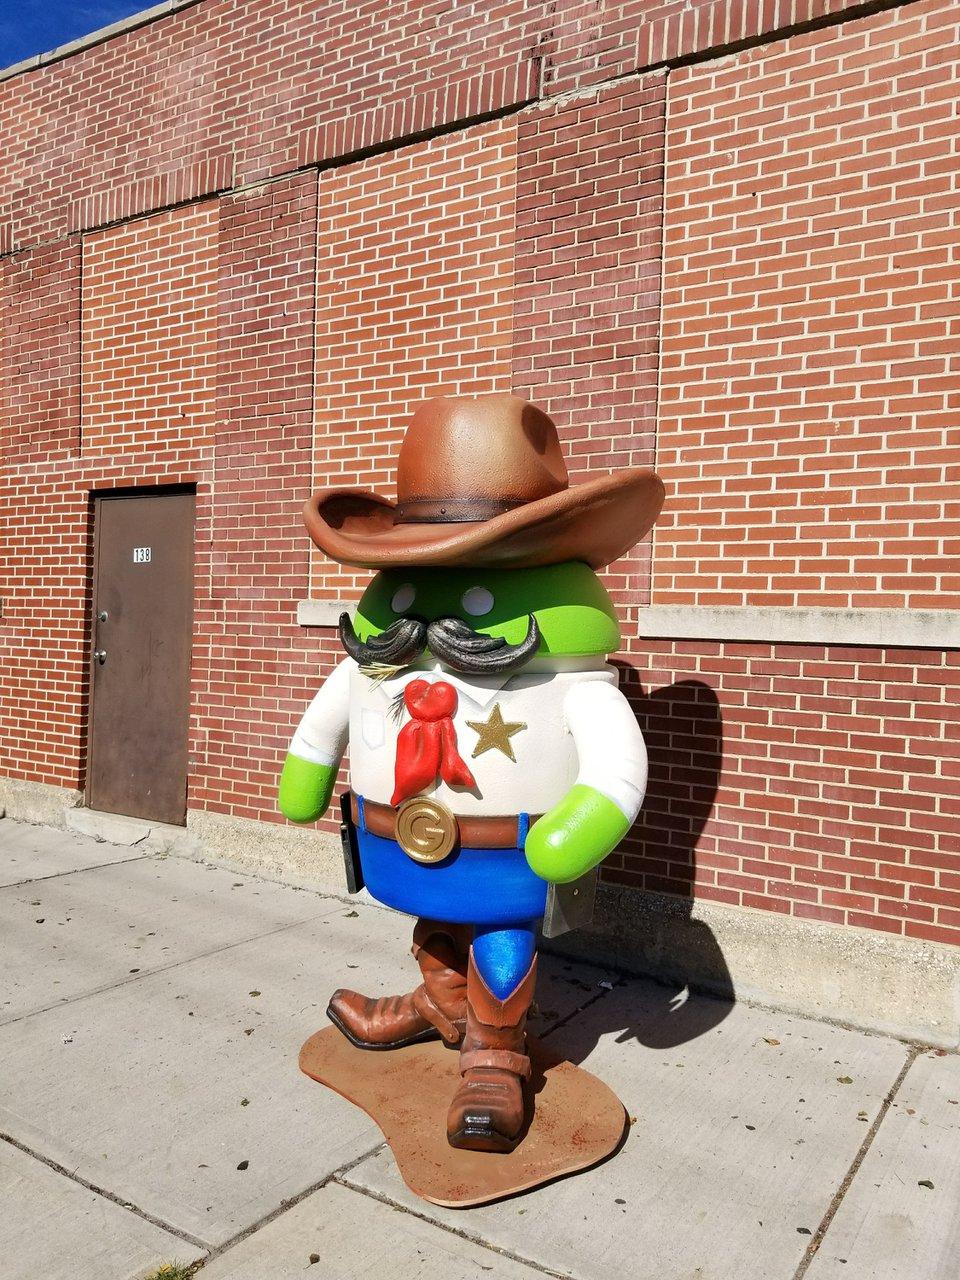 Texas Google Android photo 20170922_151531.jpg